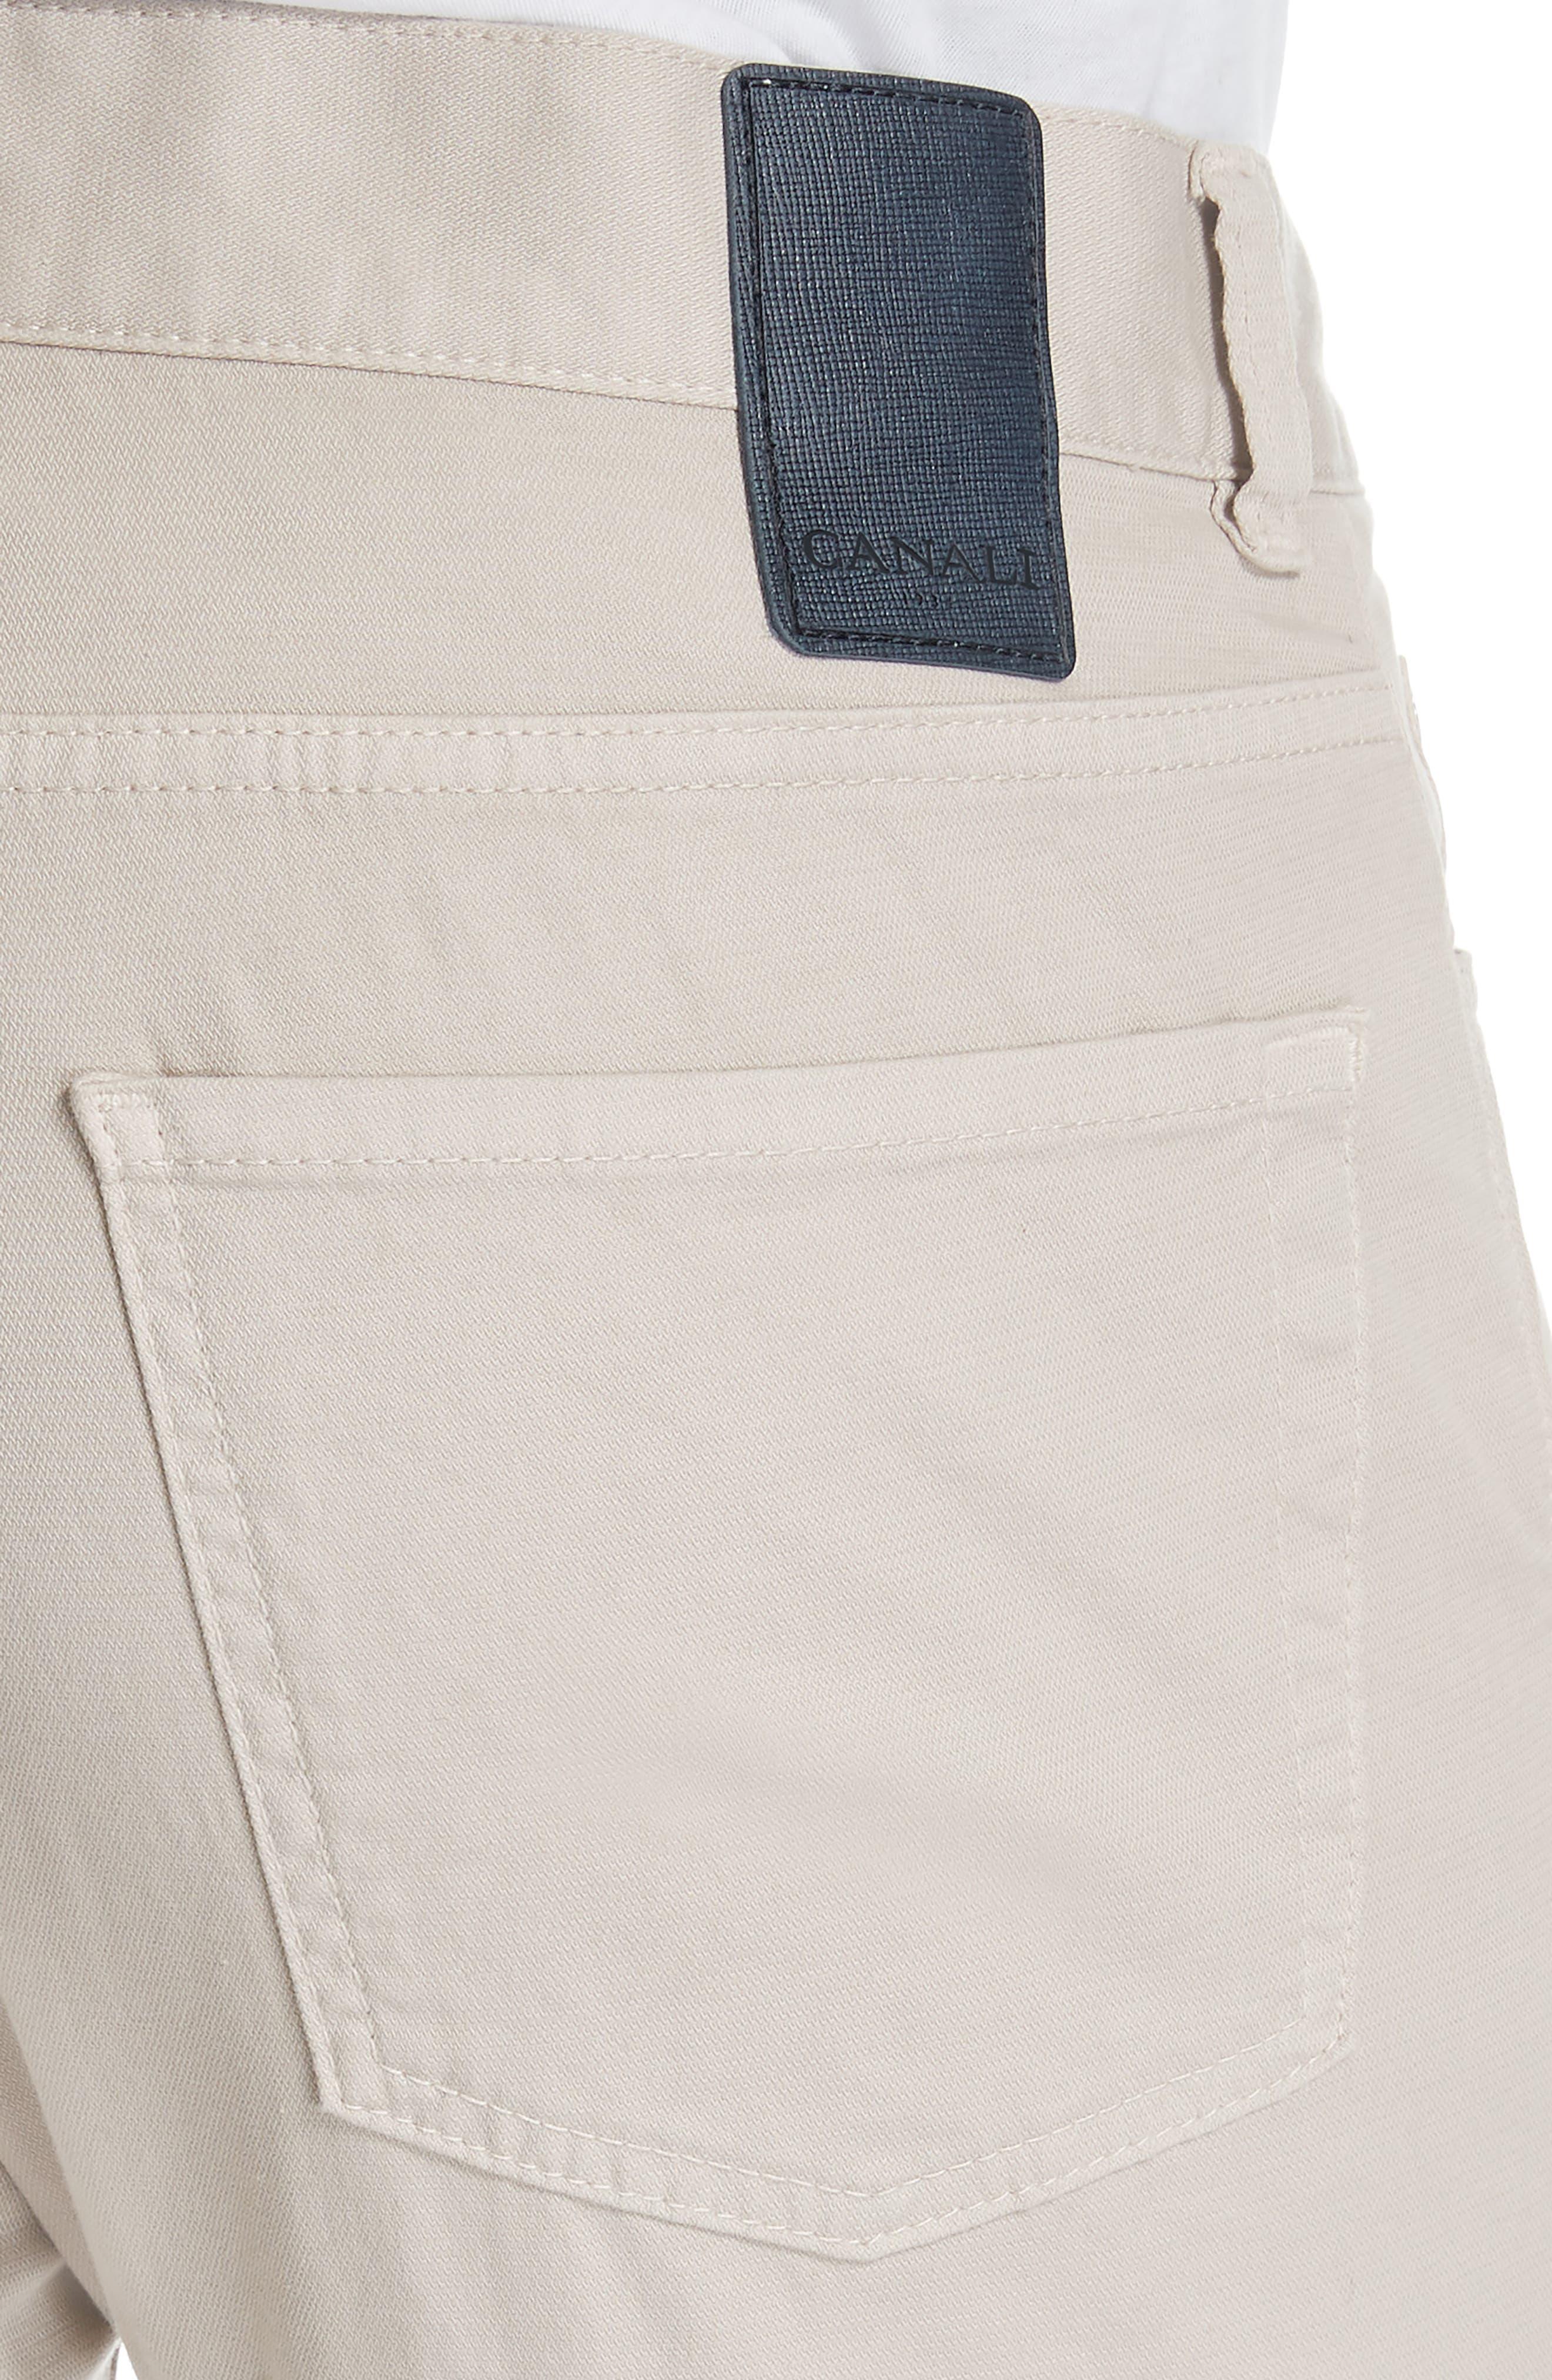 CANALI, Stretch Cotton Five Pocket Trousers, Alternate thumbnail 5, color, BEIGE